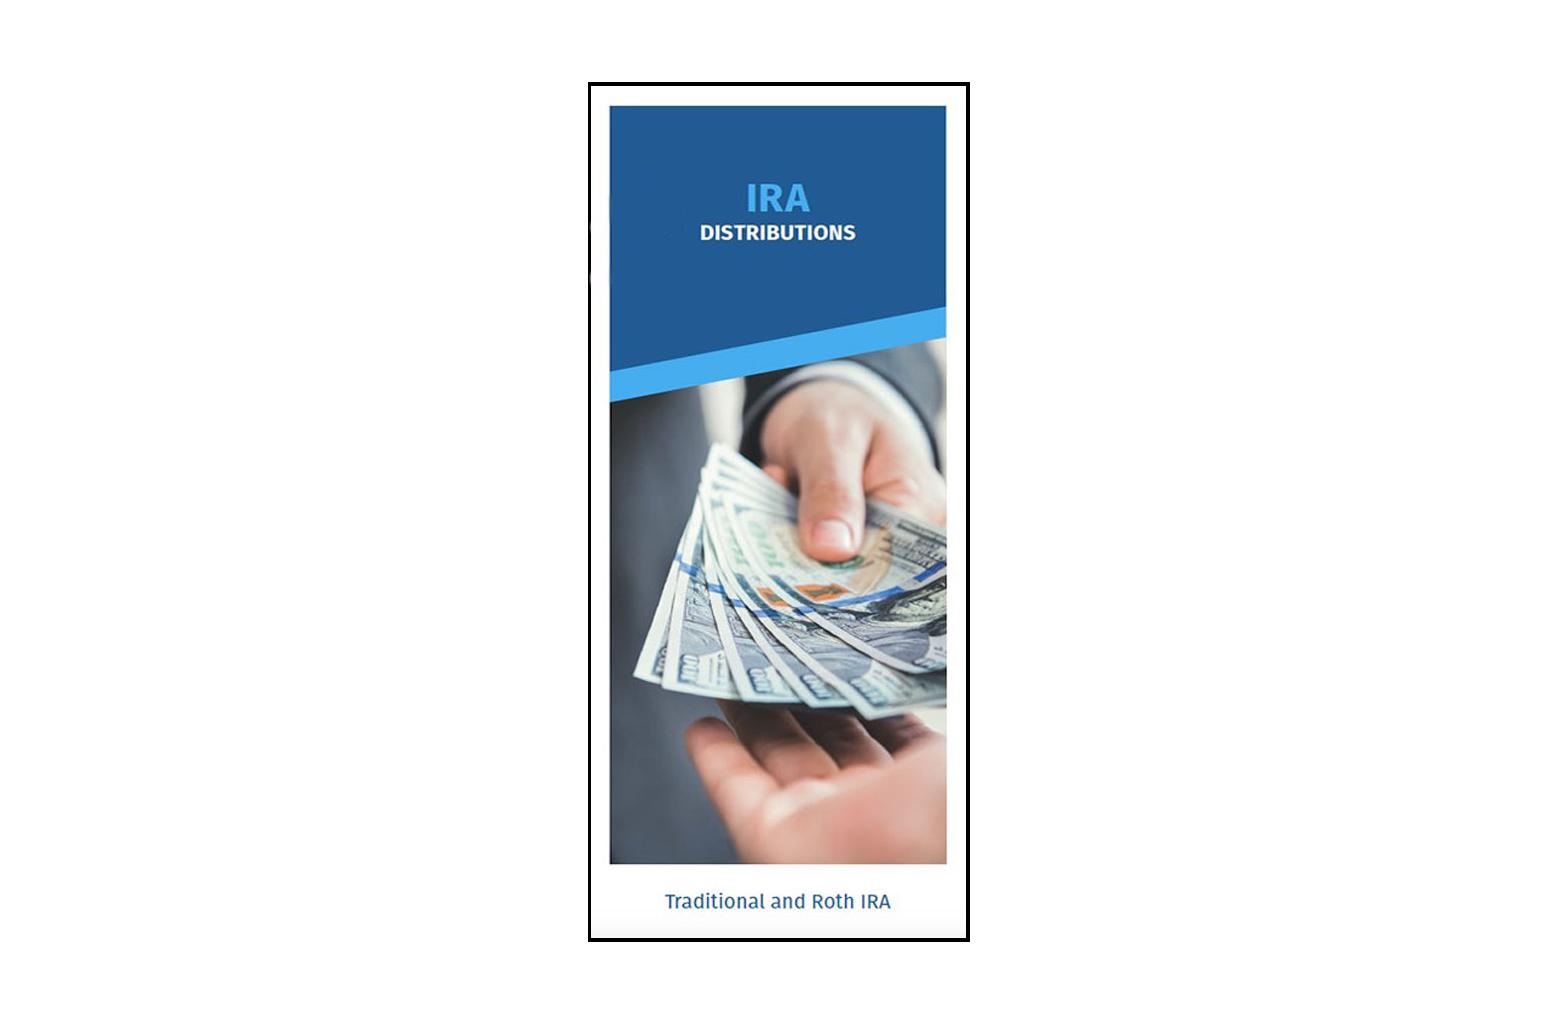 IRA Distributions Brochure